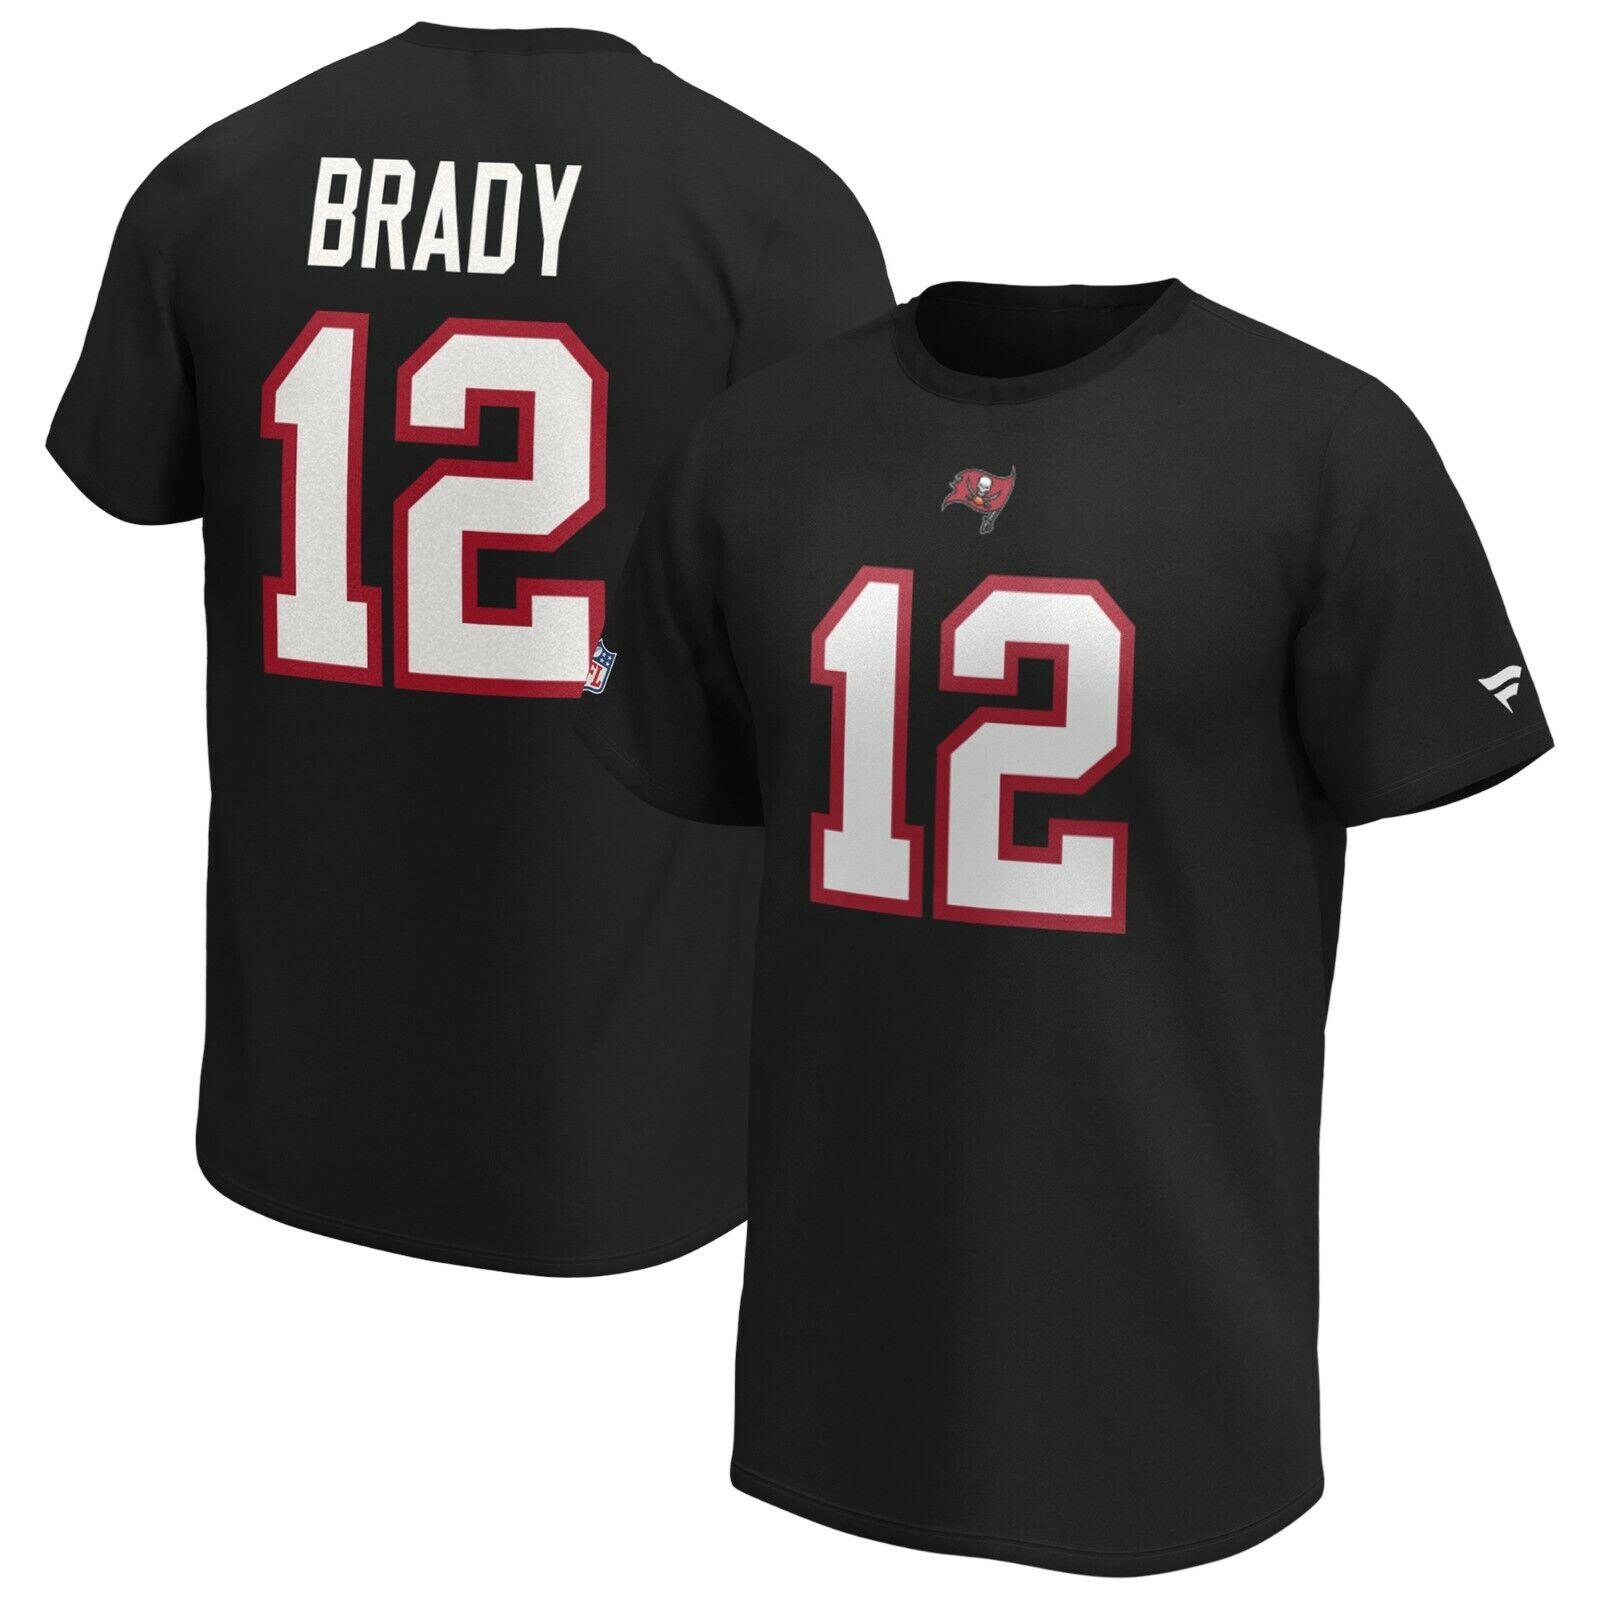 NFL T-Shirt Tampa Bay Buccaneers Tom Brady 12 schwarz Football Trikot Jersey